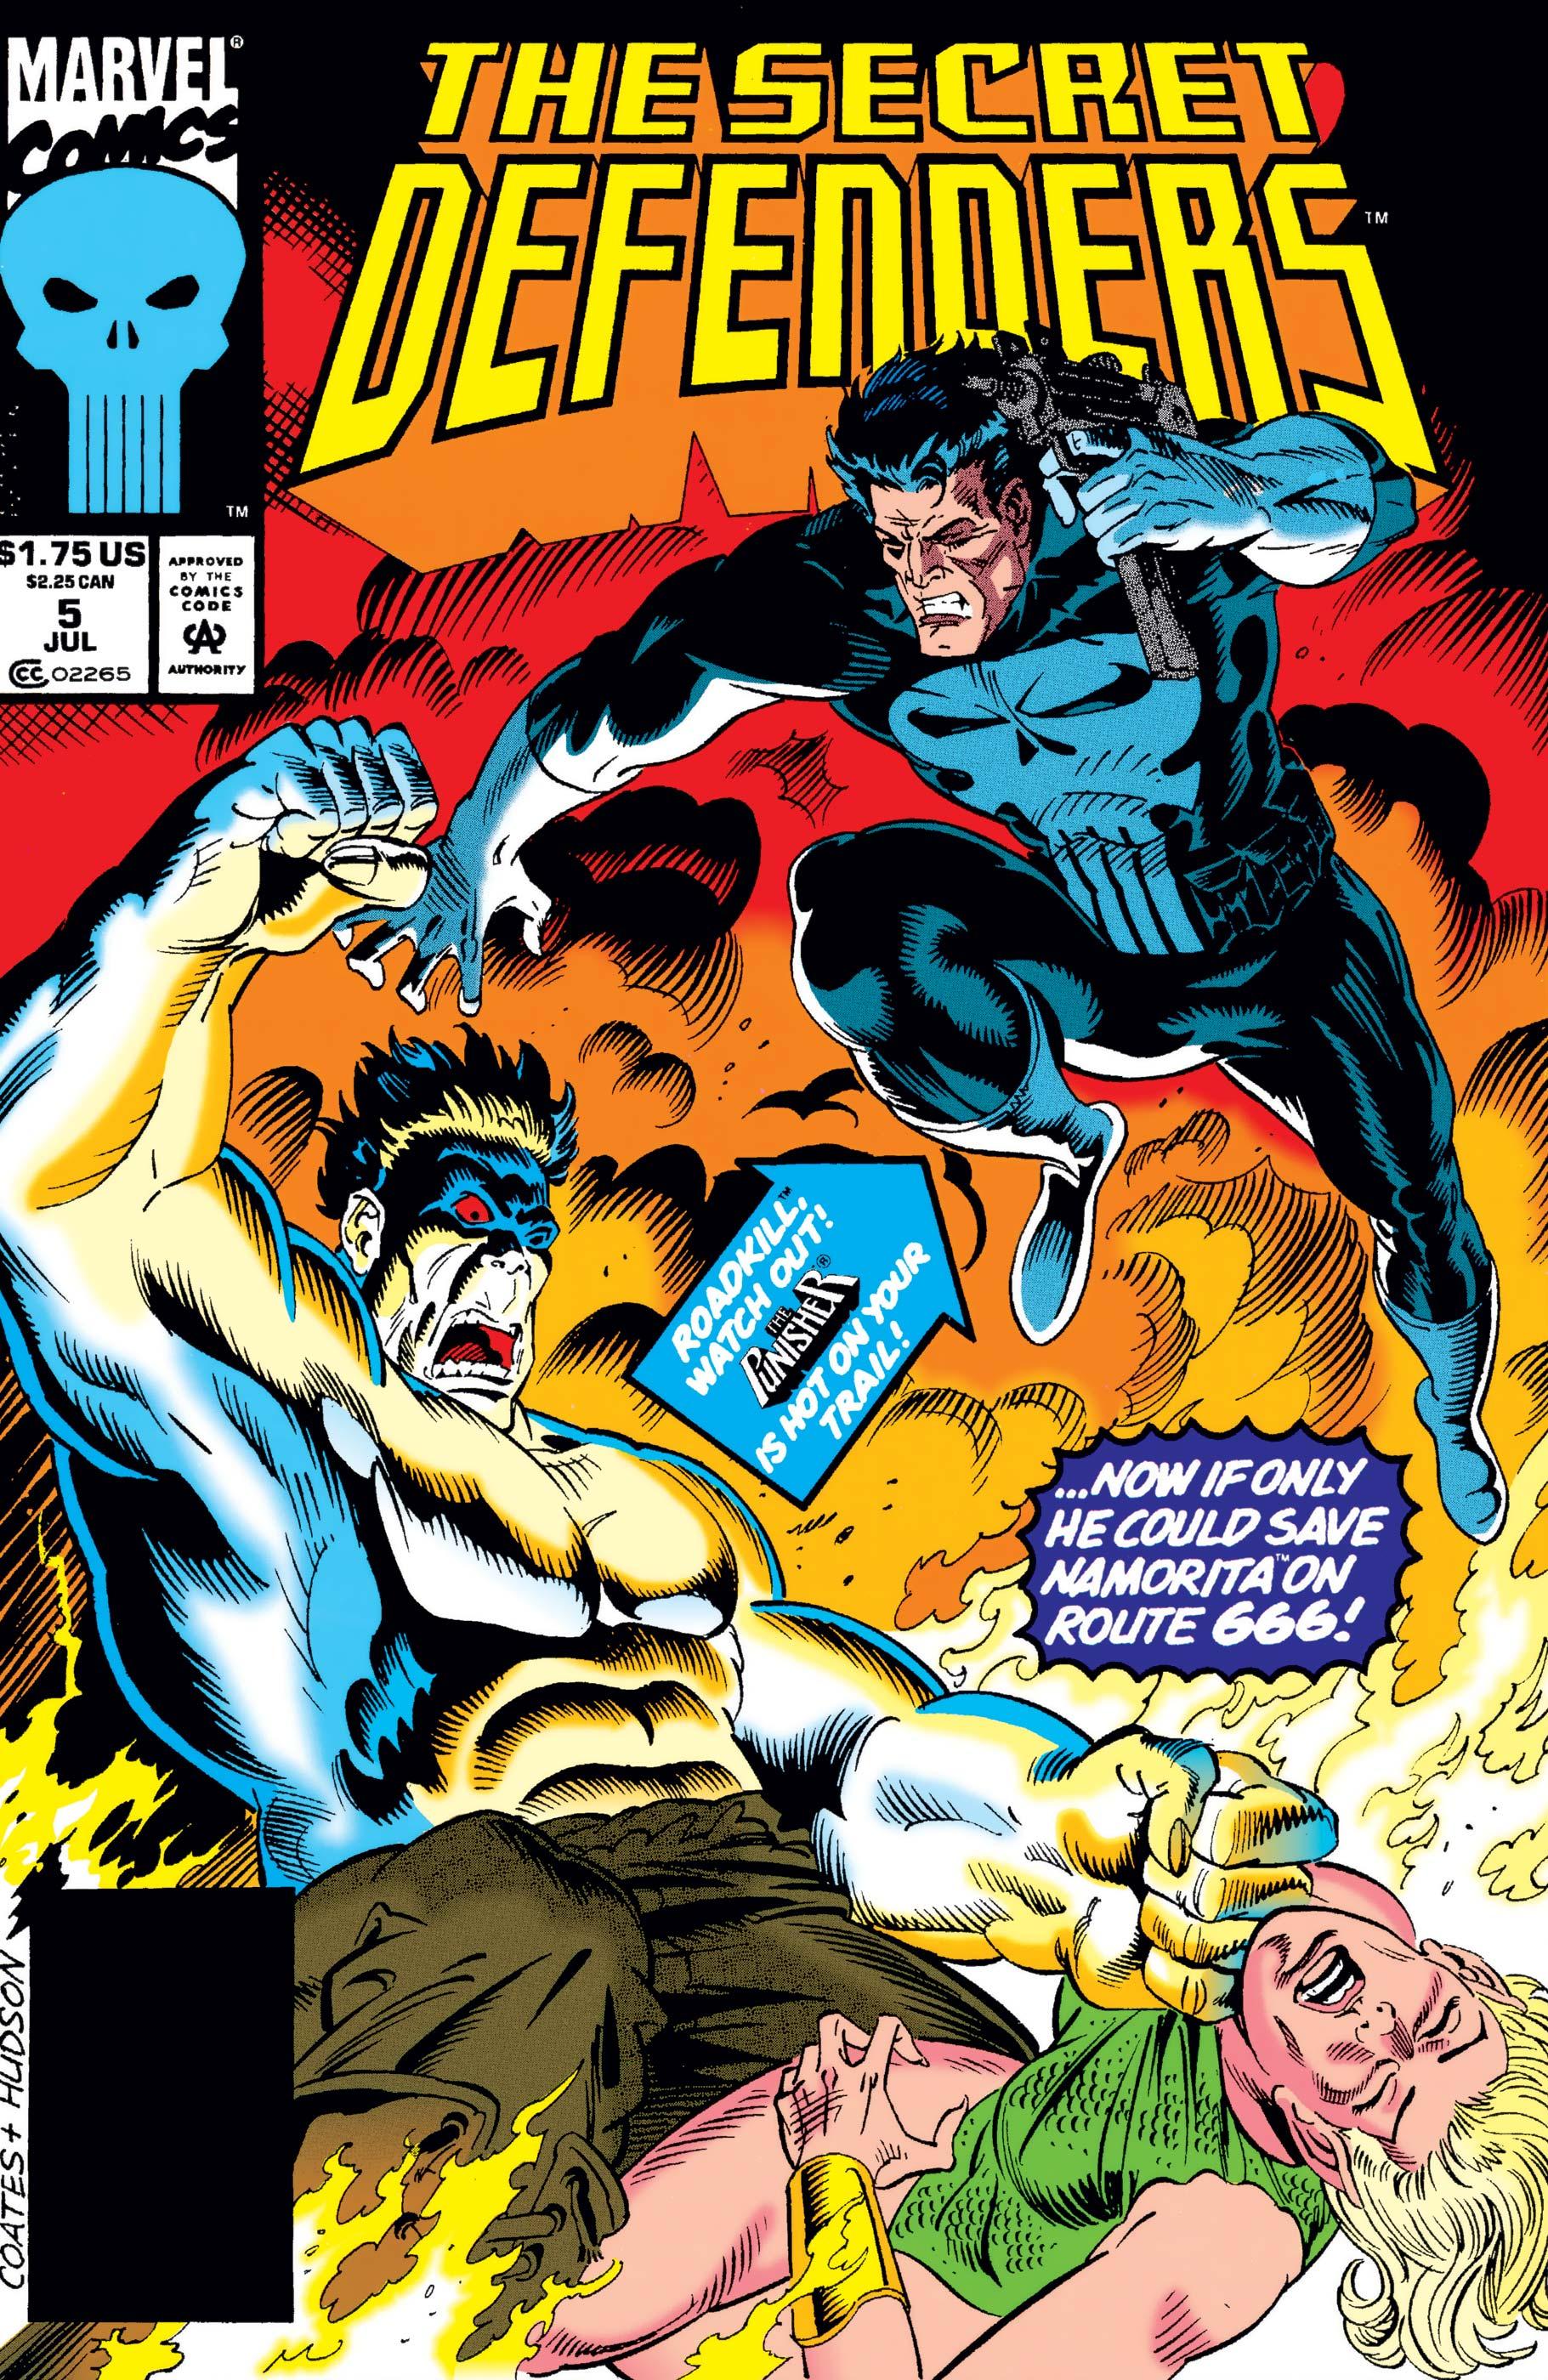 Secret Defenders (1993) #5